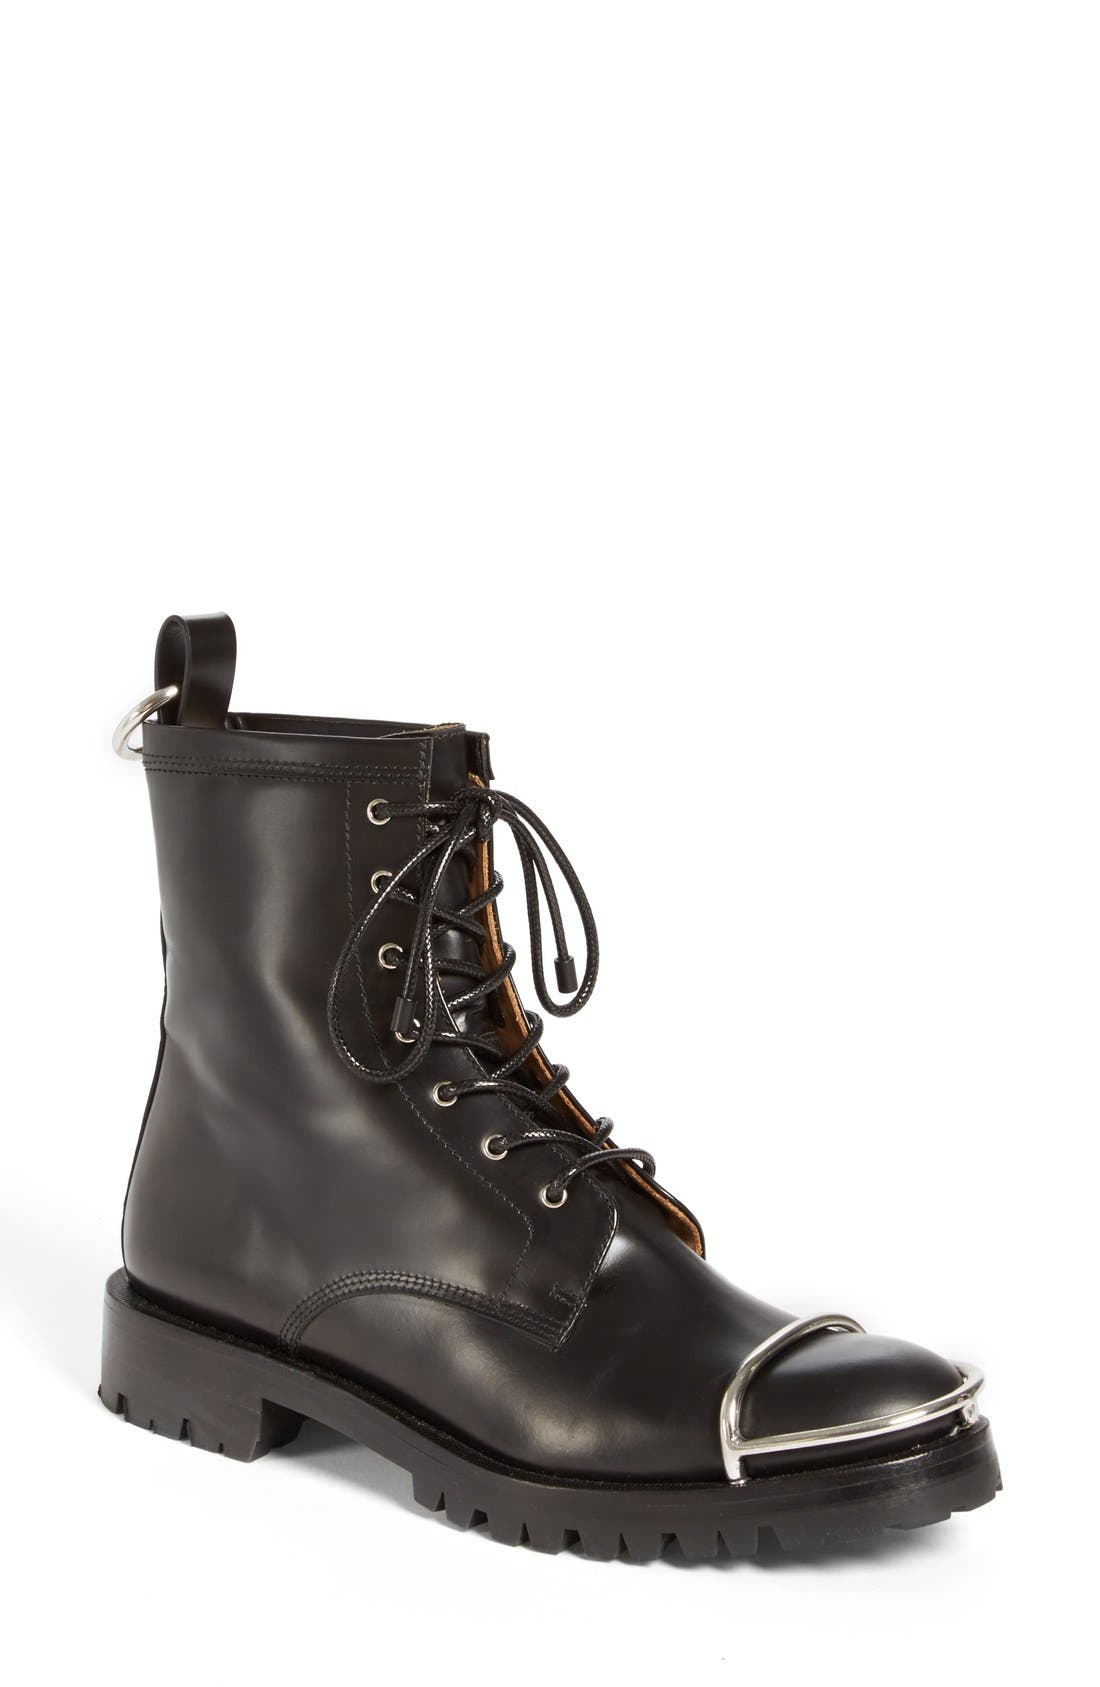 Alternate Image 1 Selected - Alexander Wang 'Lyndon' Military Boot (Women)